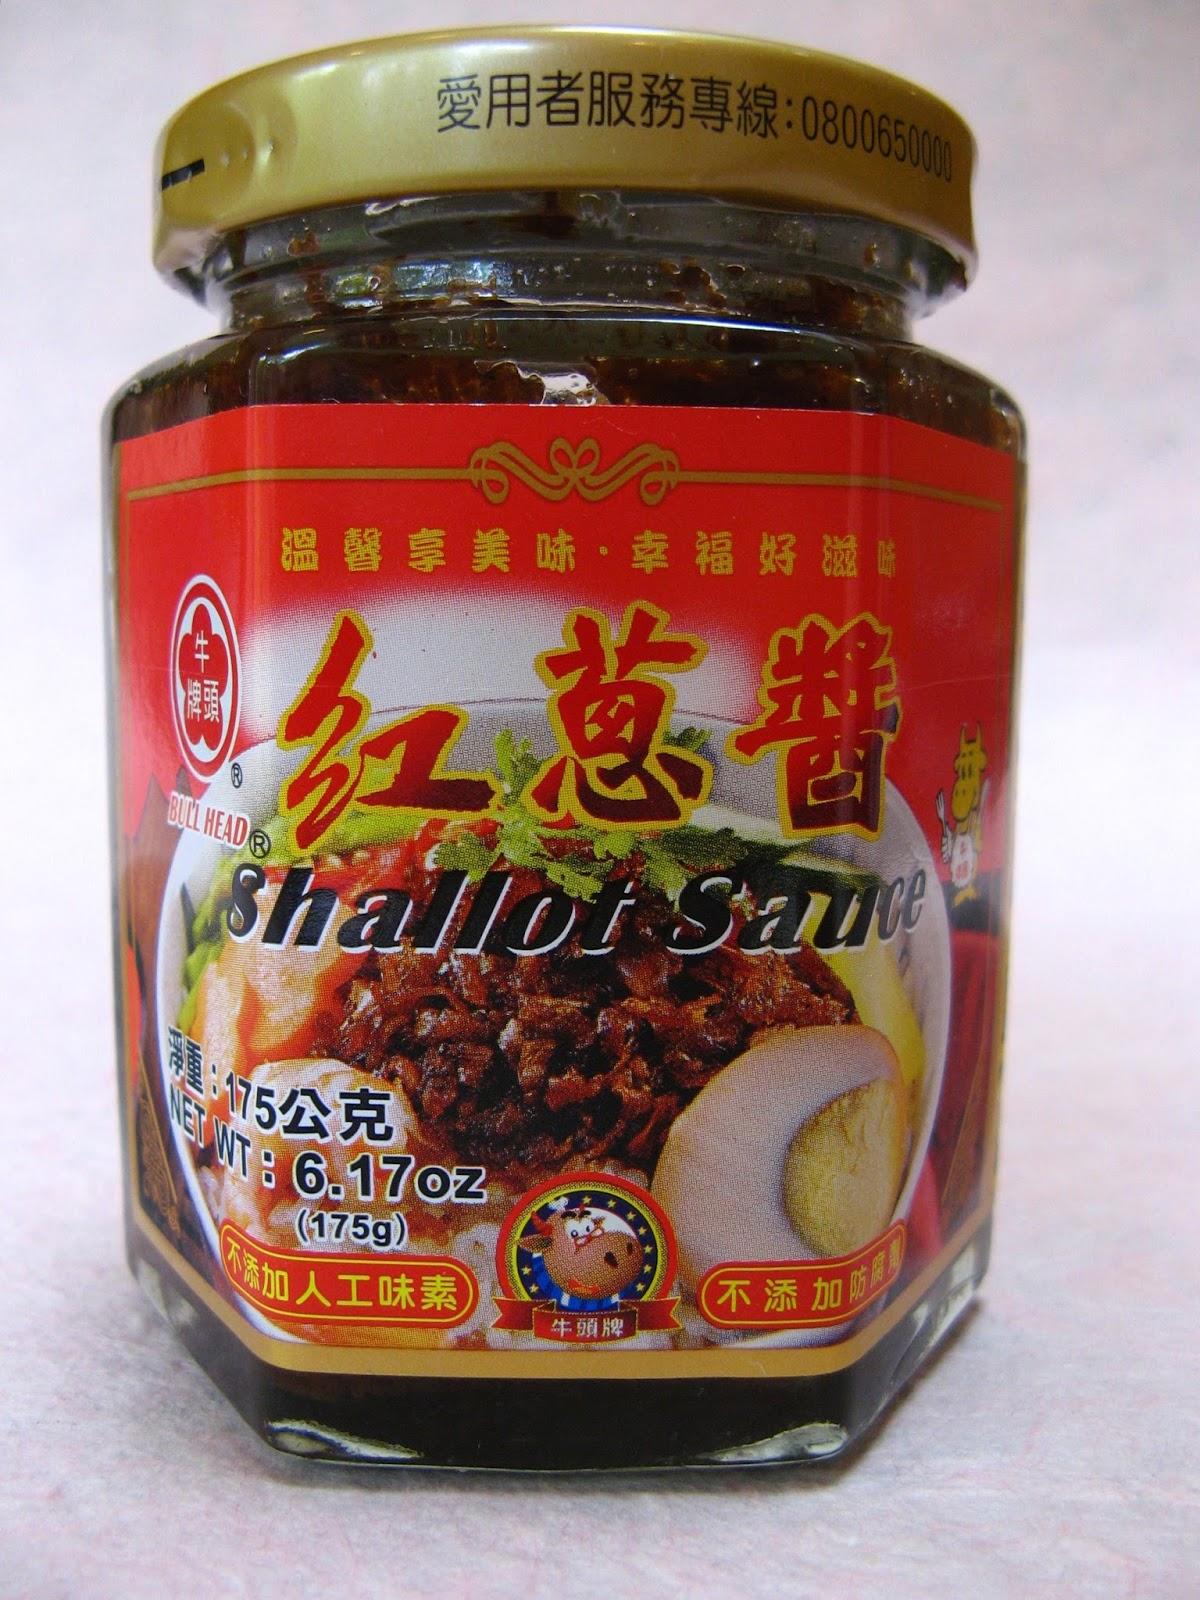 Duck Soup Easy Shallot Sauce Green Bean Shrimp 紅蔥醬青豆角蝦